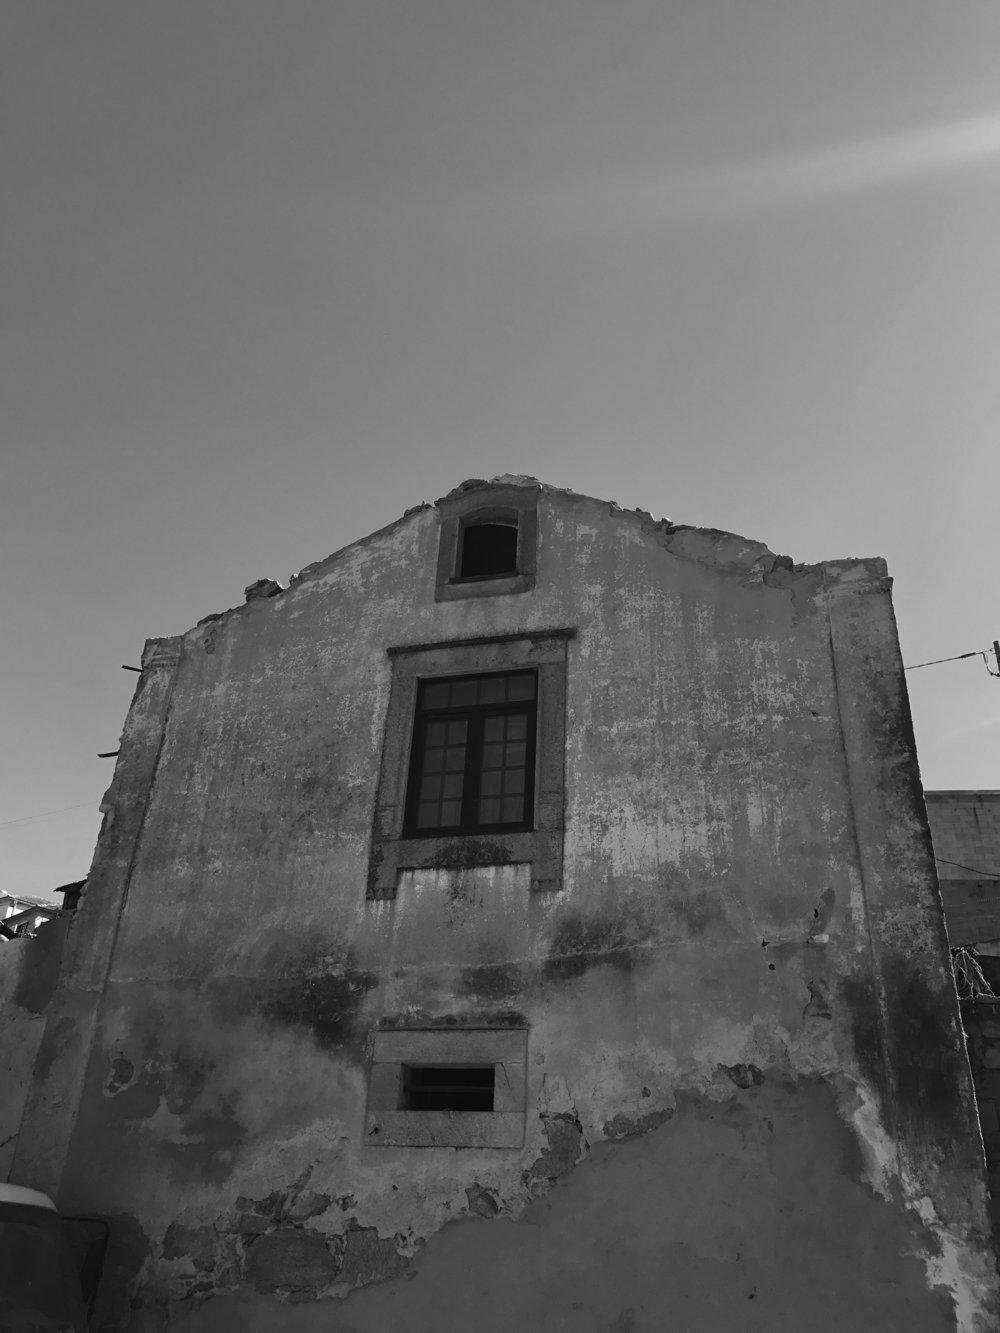 Moradia Folgorosa - Vale de Cambra - EVA atelier - Arquitectura - Obra (2).jpg